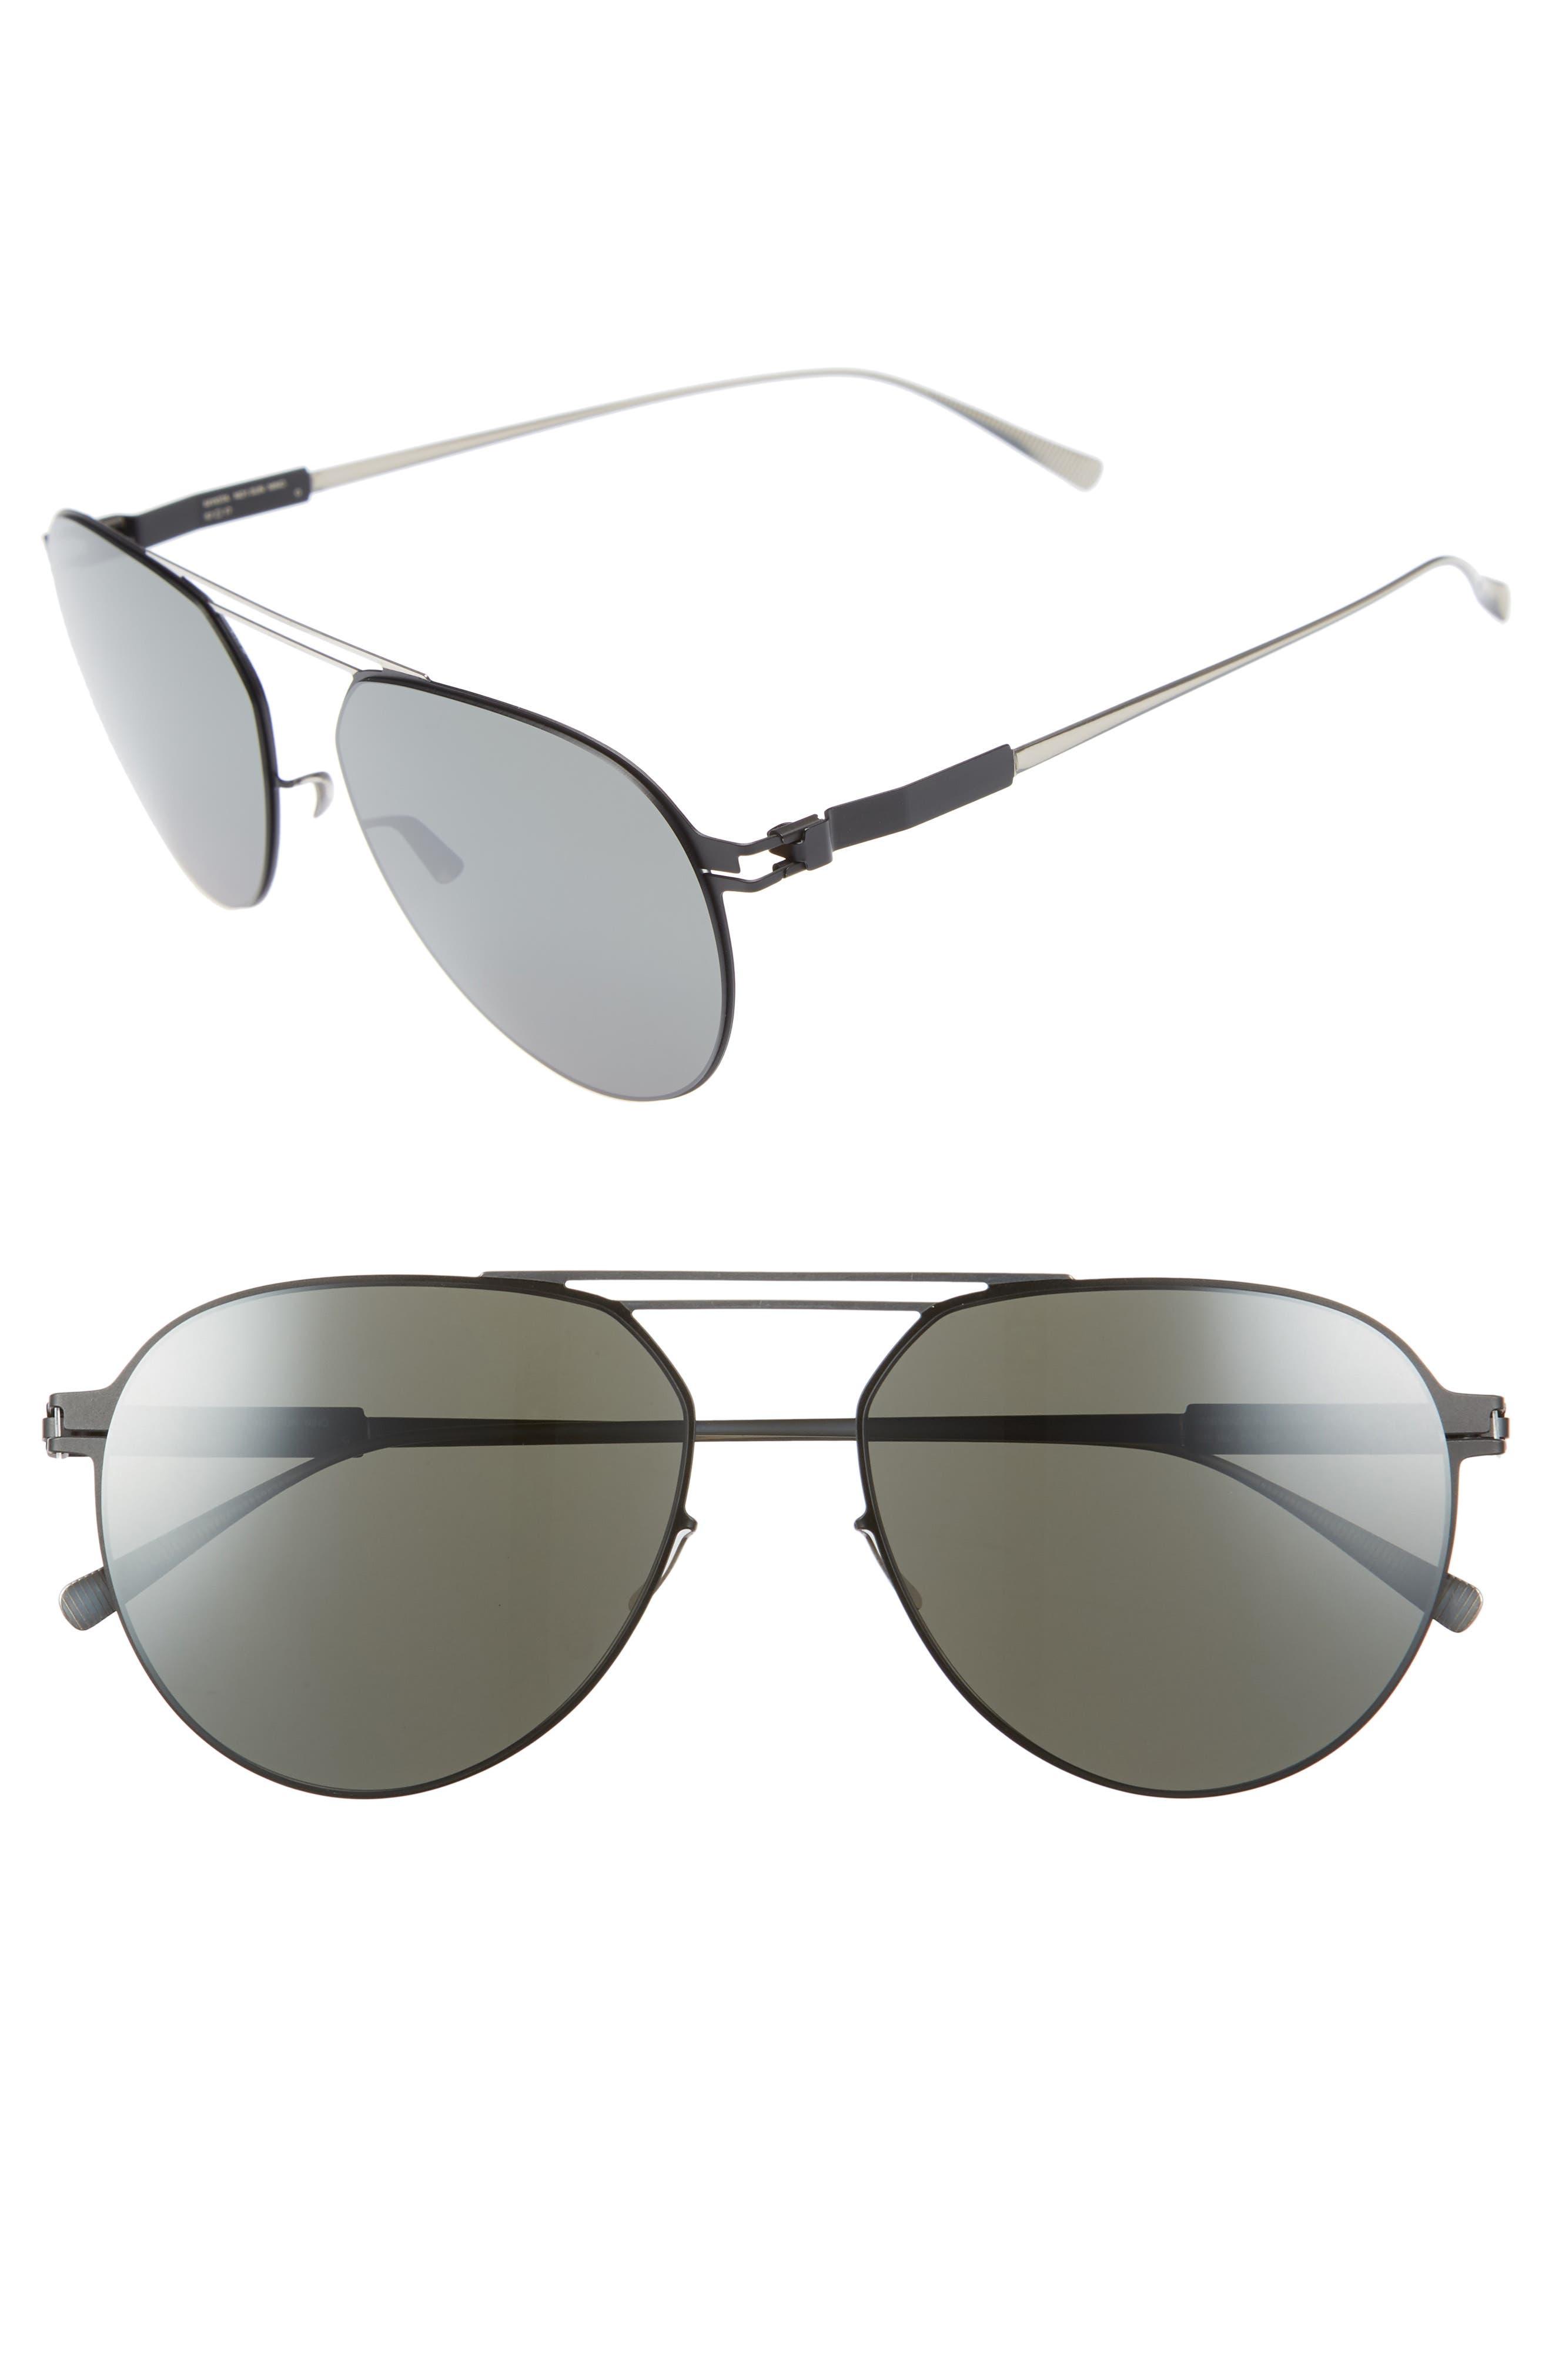 Nino 57mm Aviator Sunglasses,                             Main thumbnail 1, color,                             Silver/ Black